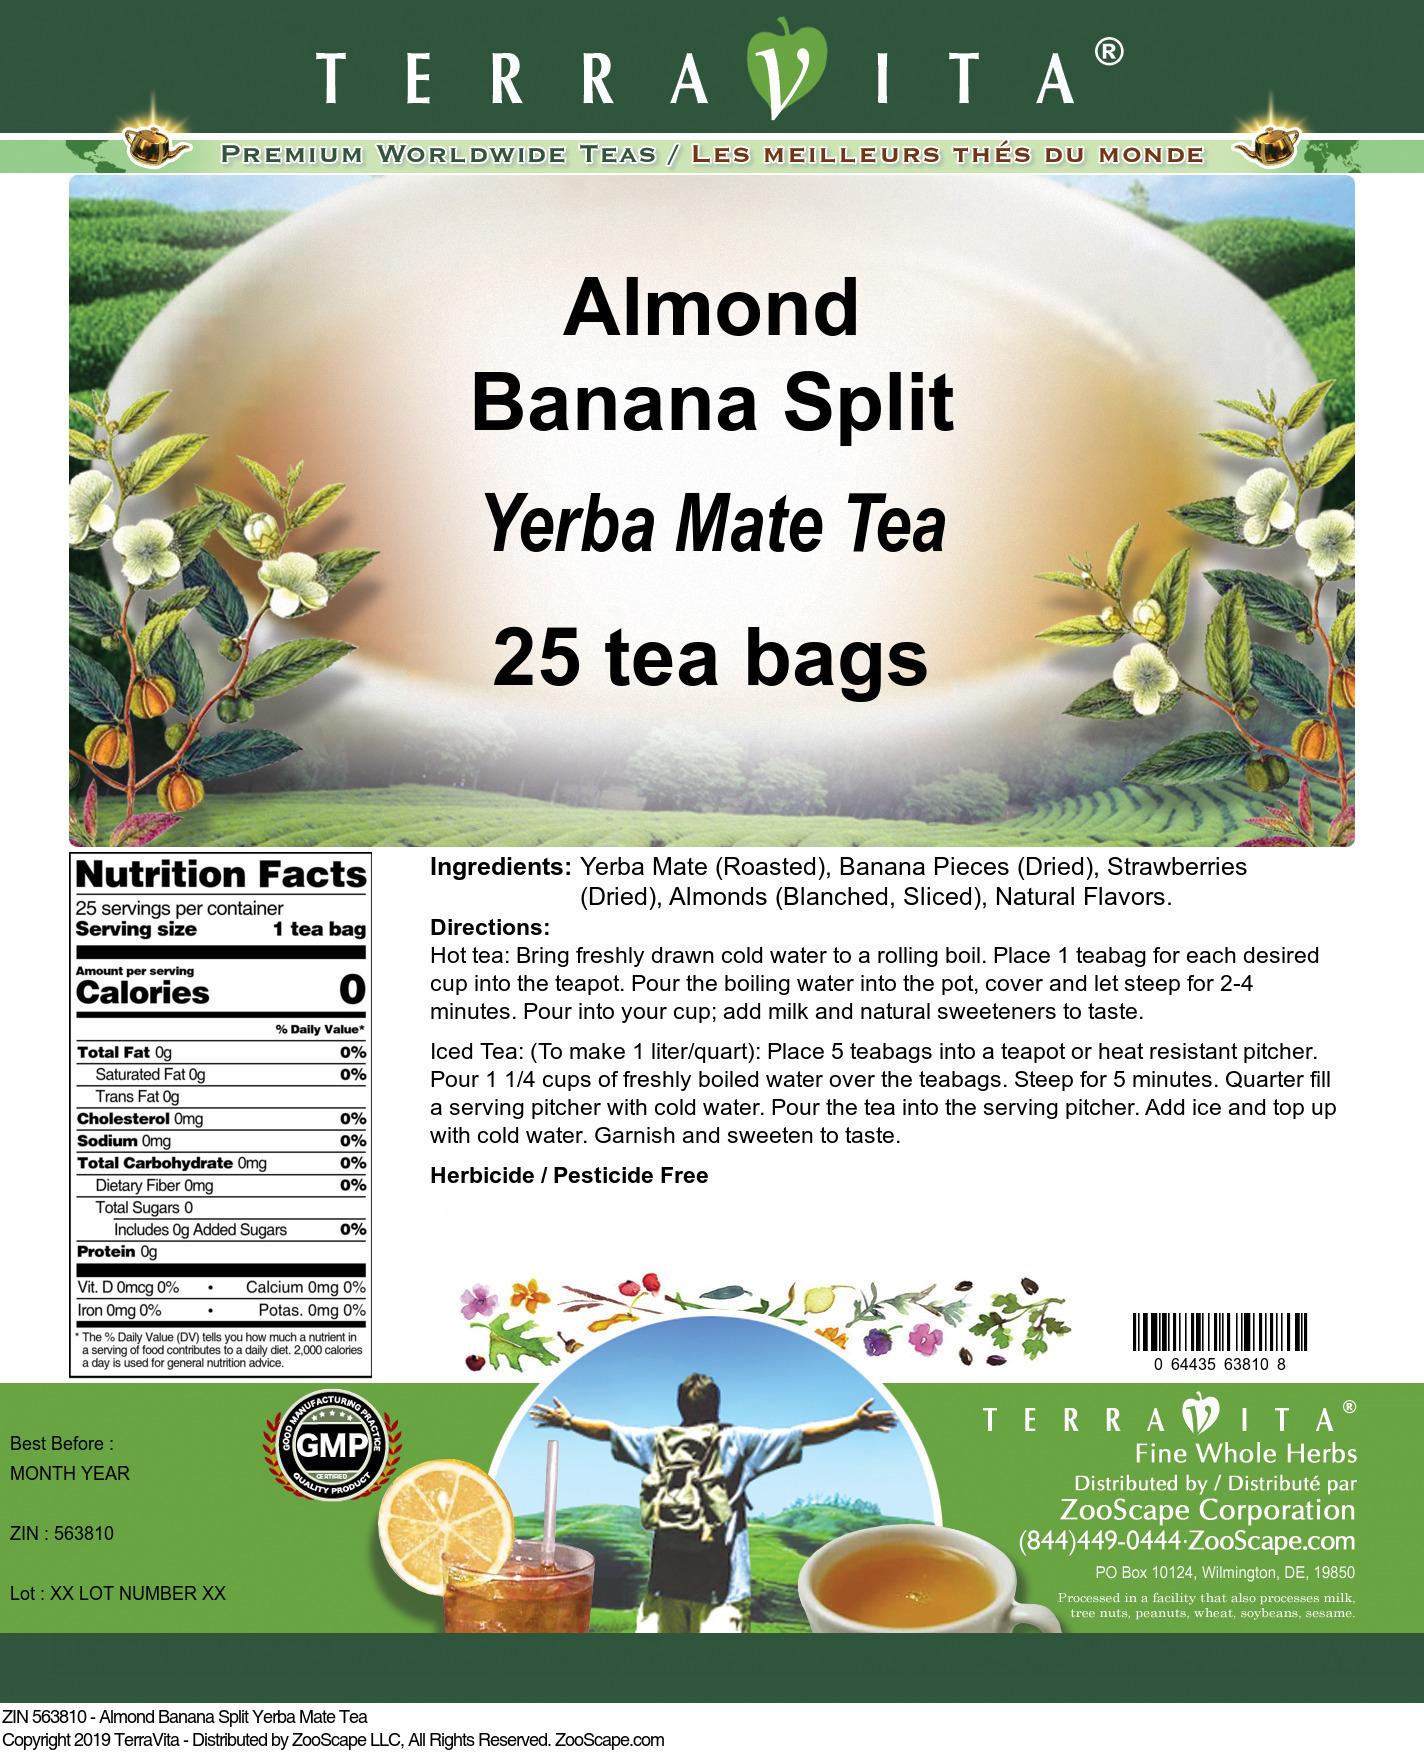 Almond Banana Split Yerba Mate Tea